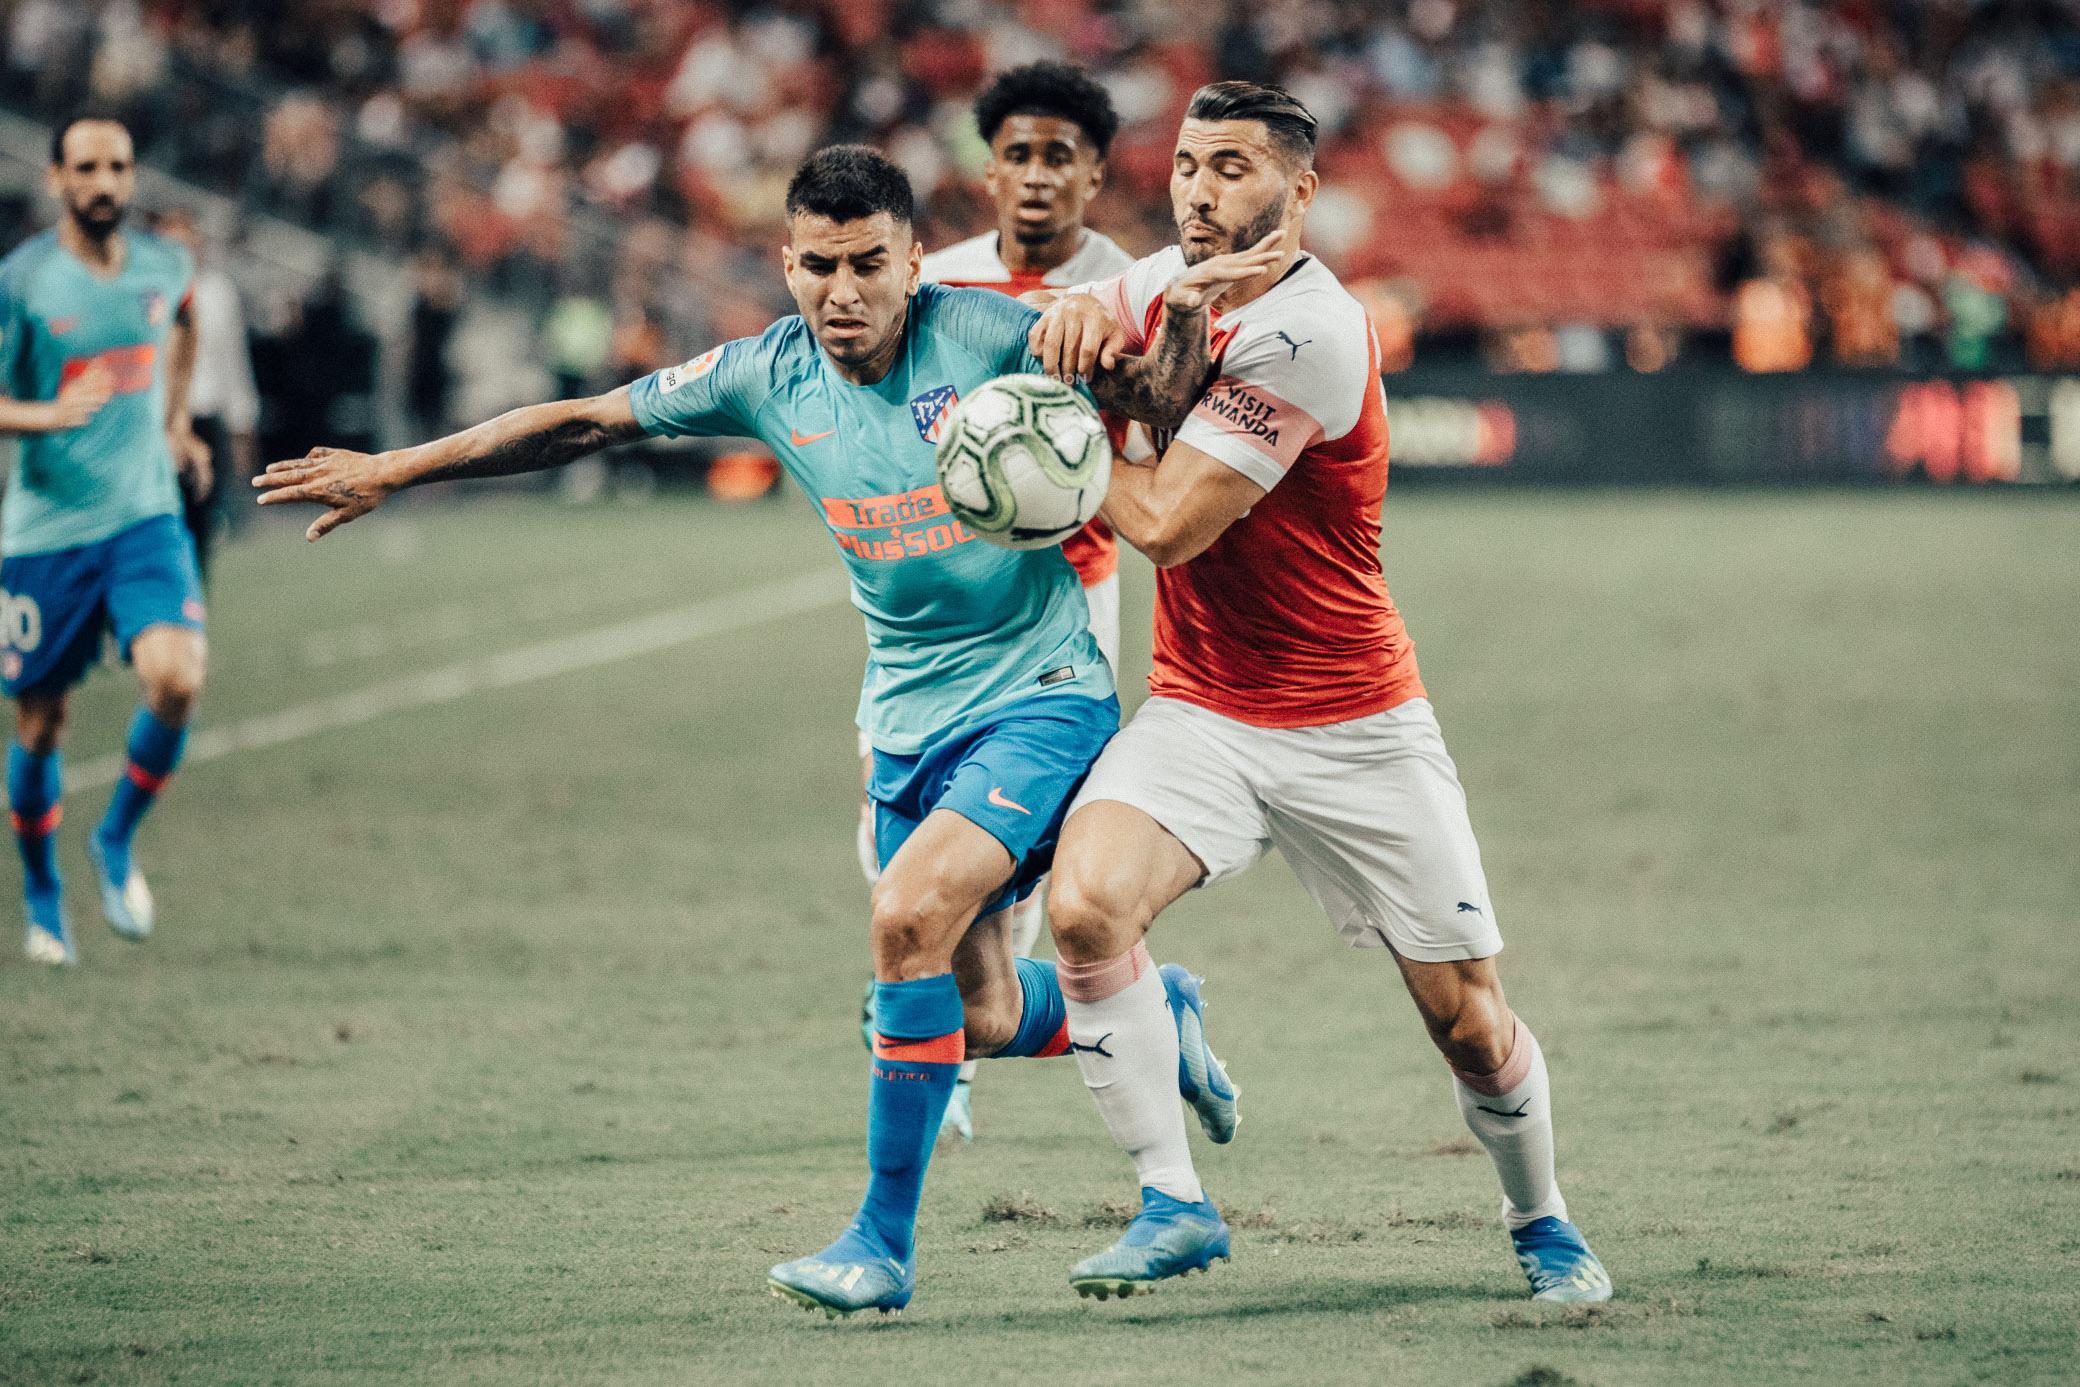 ICC 2018: ARSENAL VS ATLETICO (ANGEL CORREA)